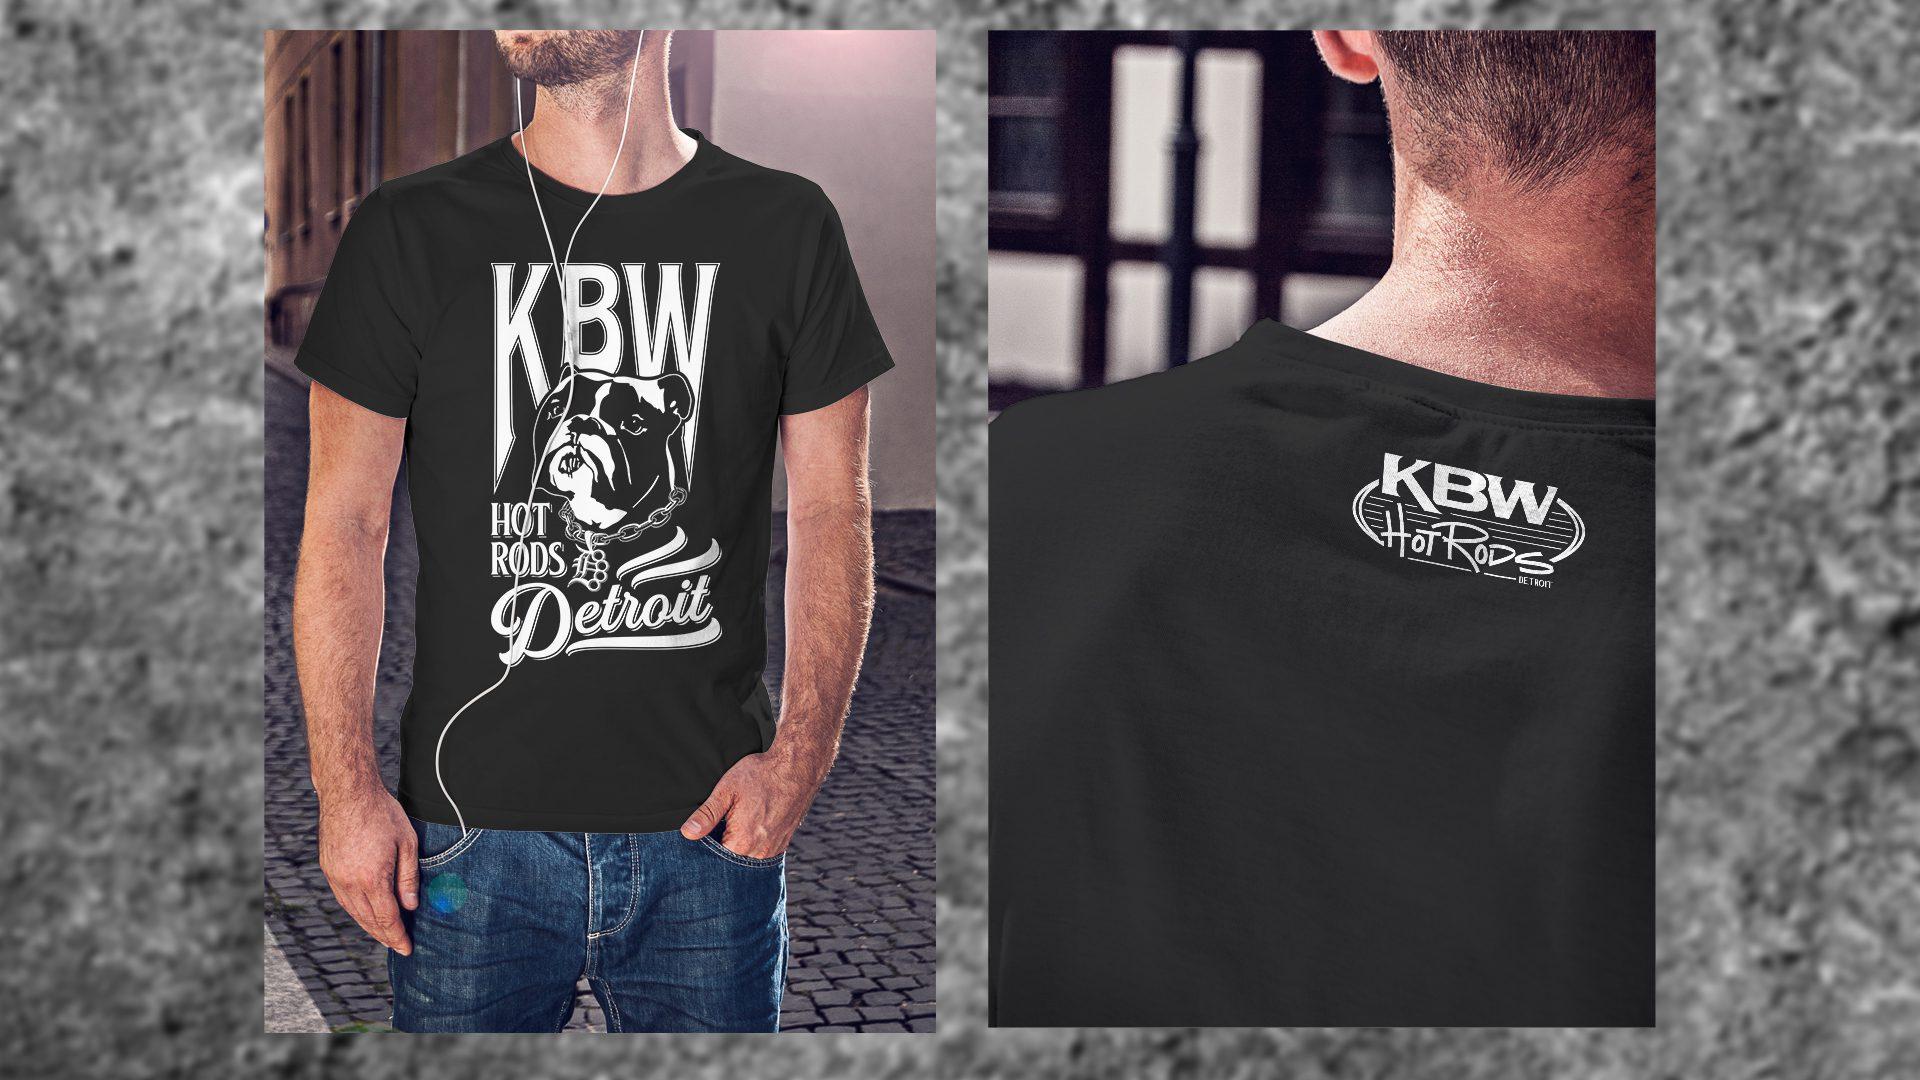 Kreative Body Werks - Bulldog T-shirt (2)